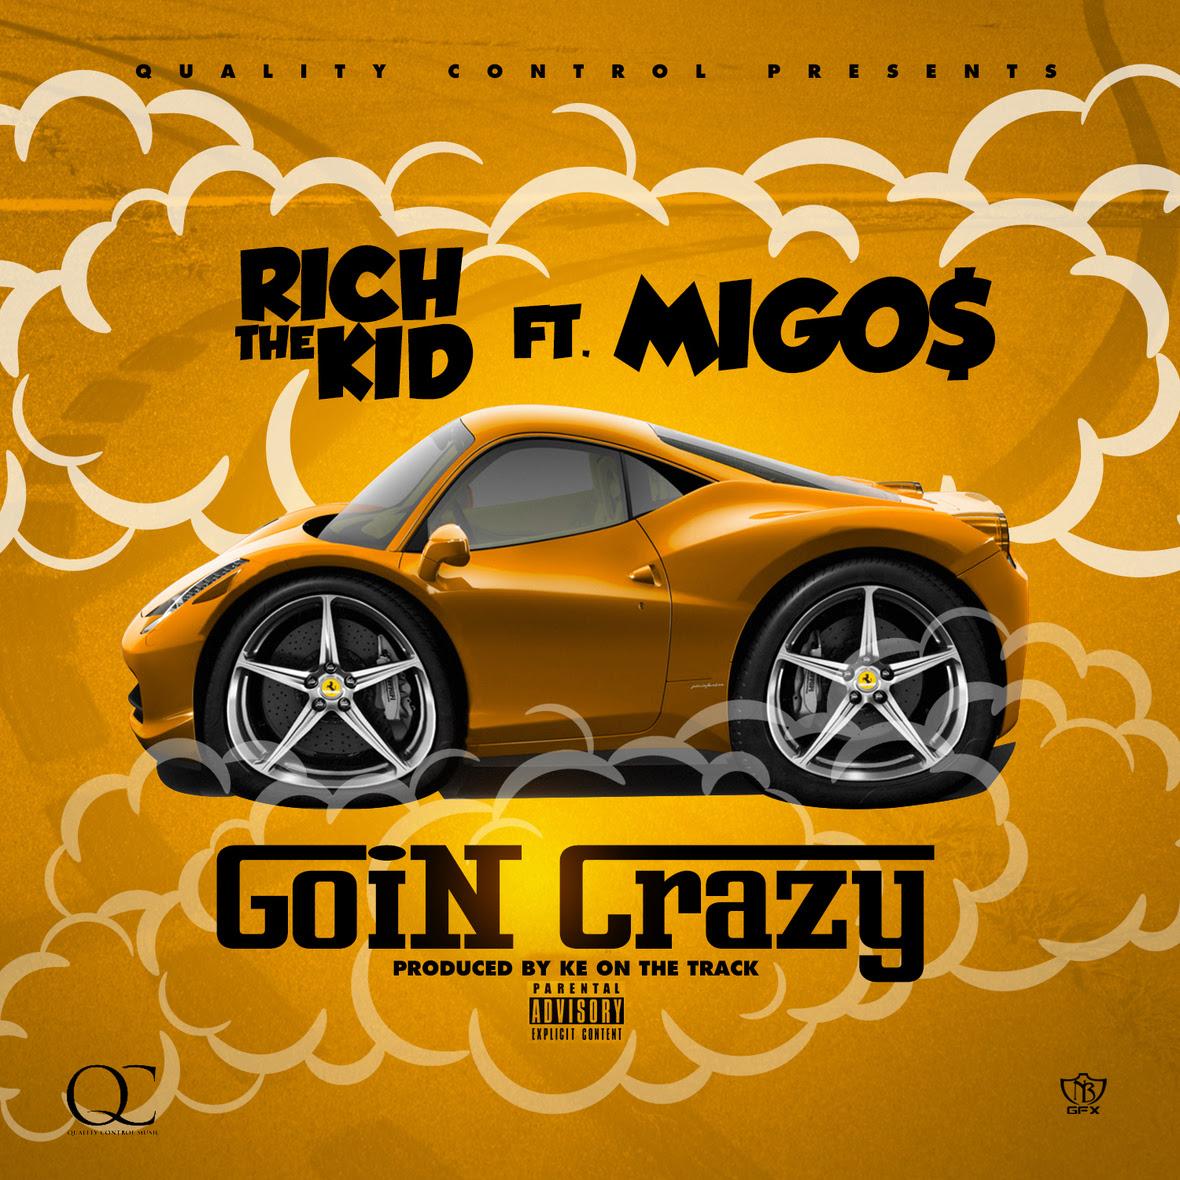 Rich The Kid ft Migos - Goin Crazy